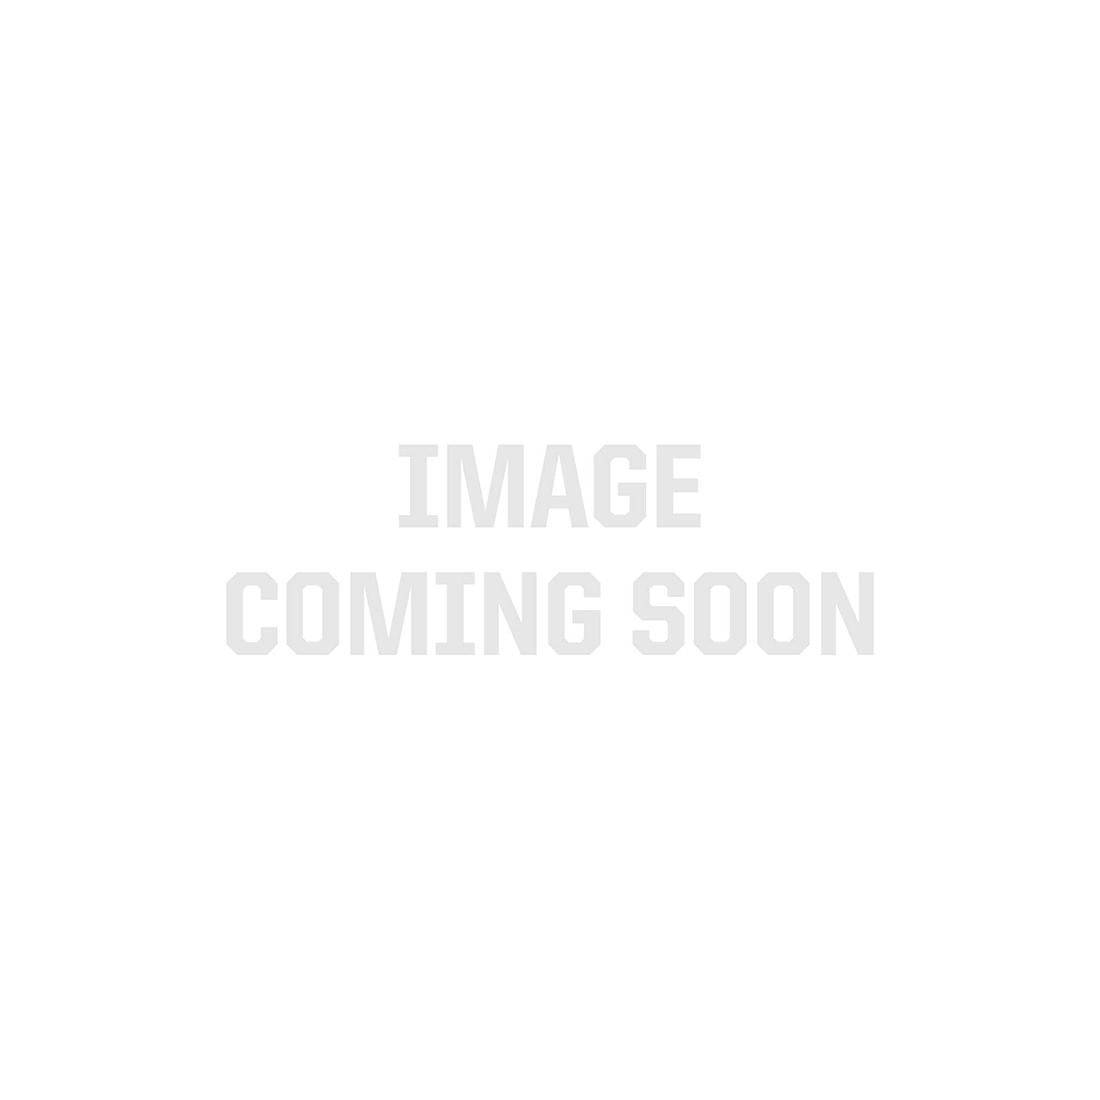 Kichler Design Pro LED Interconnect (10 feet long) (Black) (Optional)